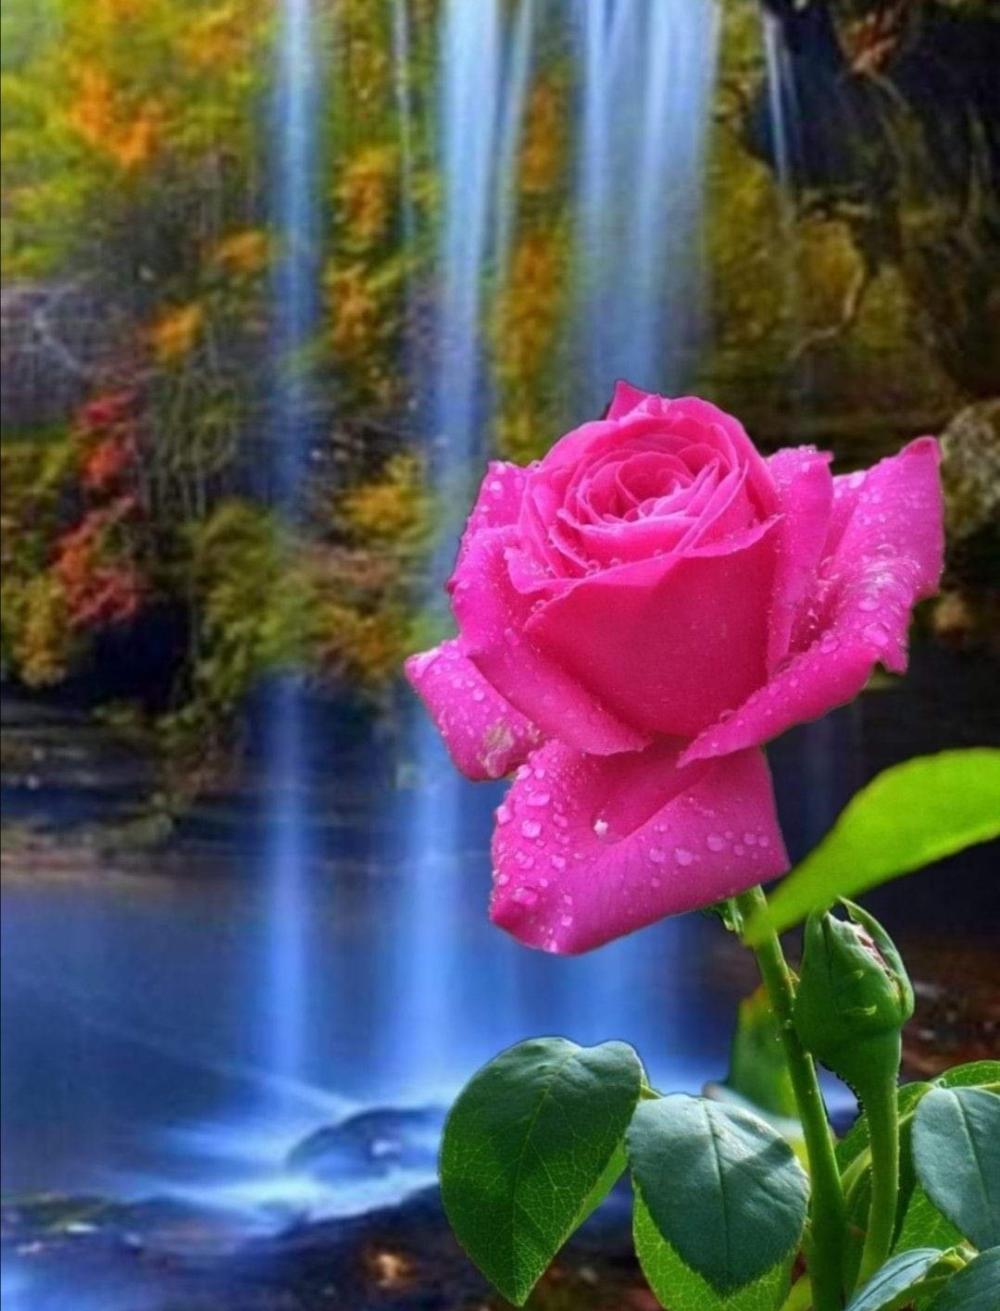 Dh A Na On Twitter Rose Flower Wallpaper Beautiful Rose Flowers Spring Flower Art